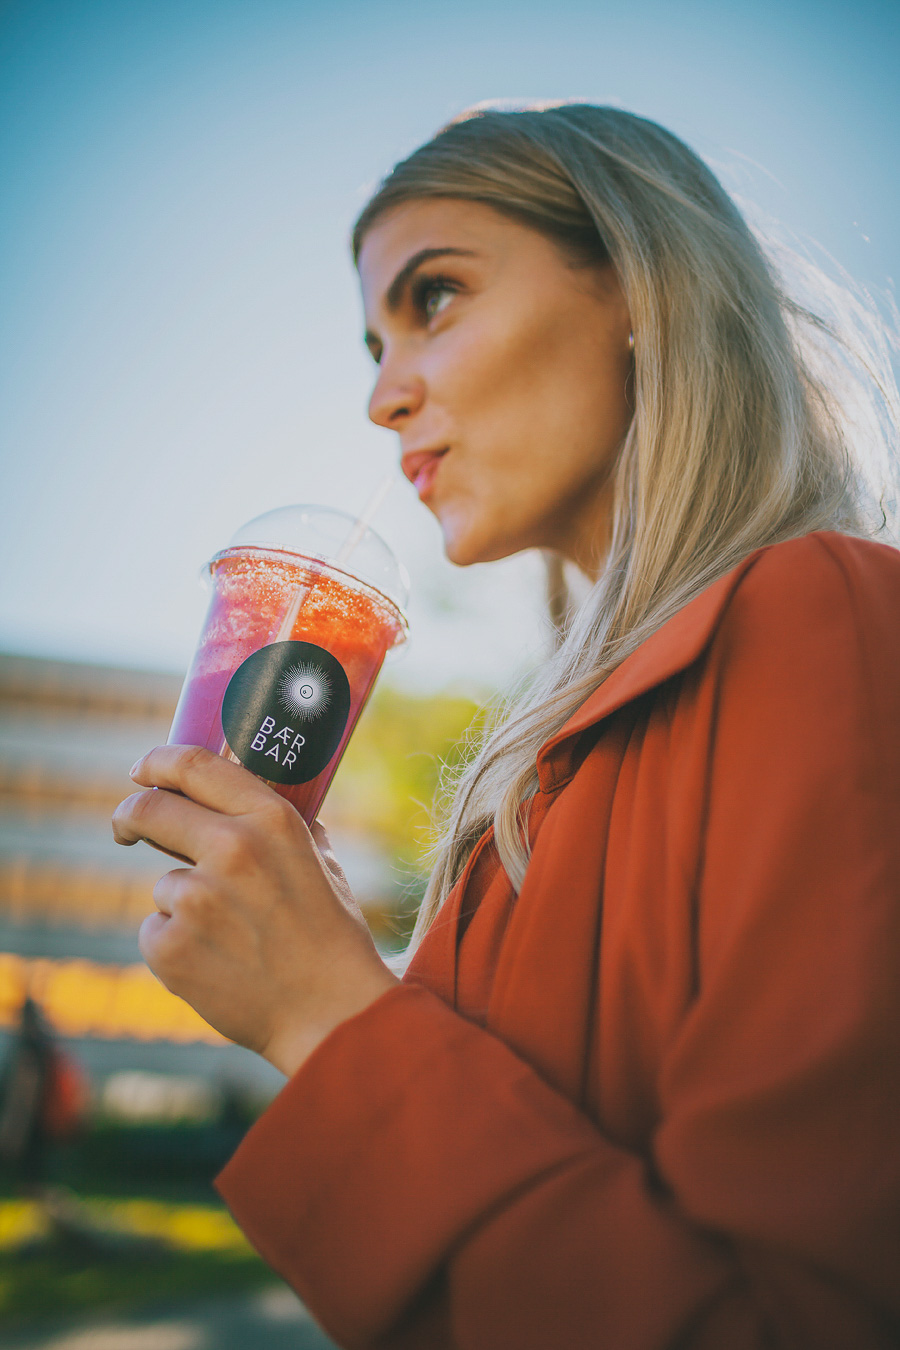 Blonde girl drinking strawberry smoothie